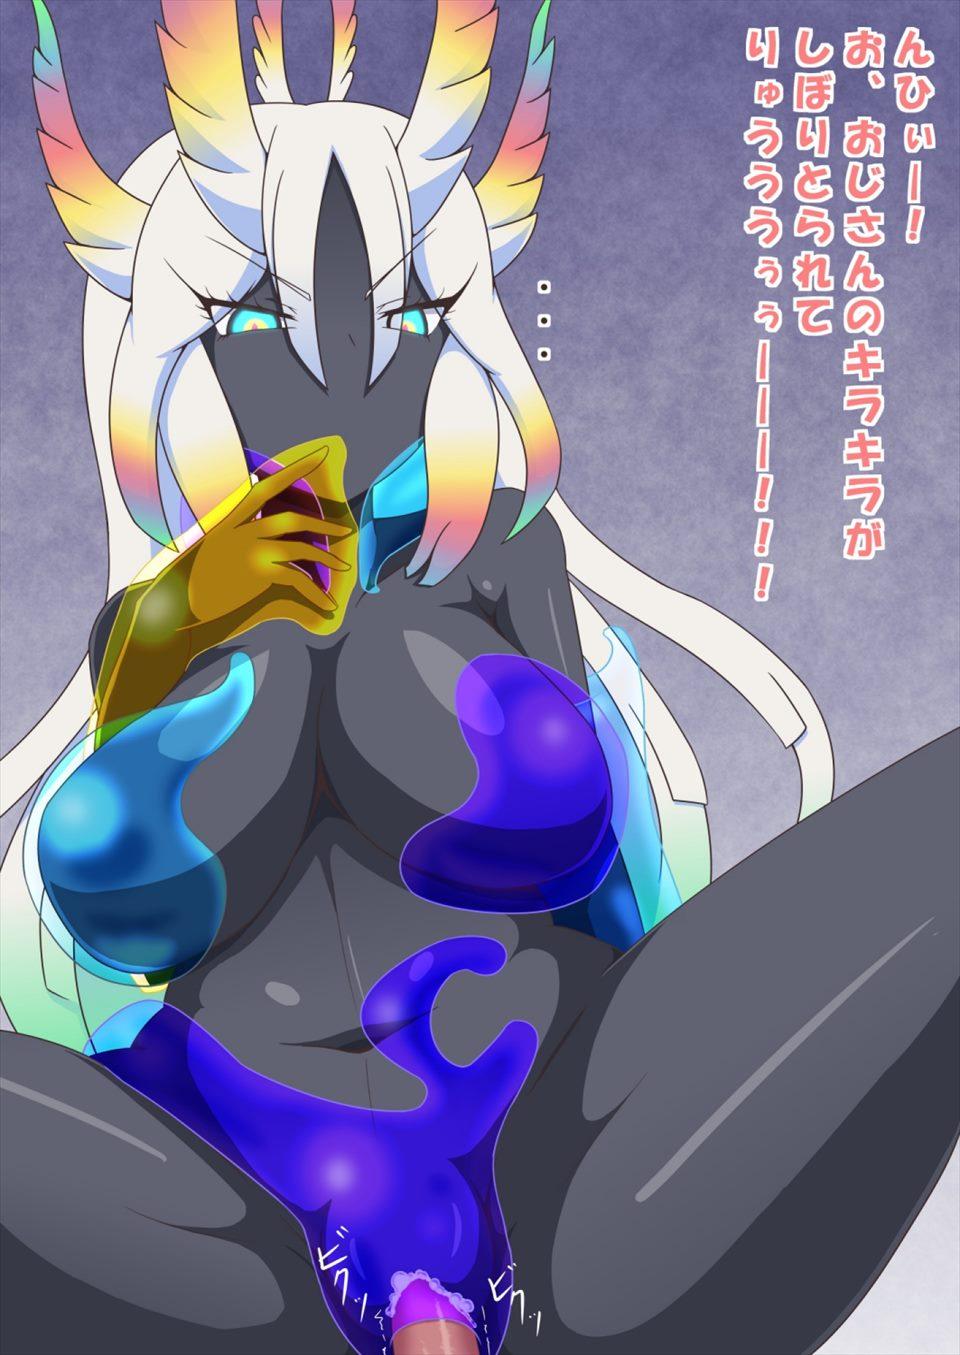 kemonoエロ画像20